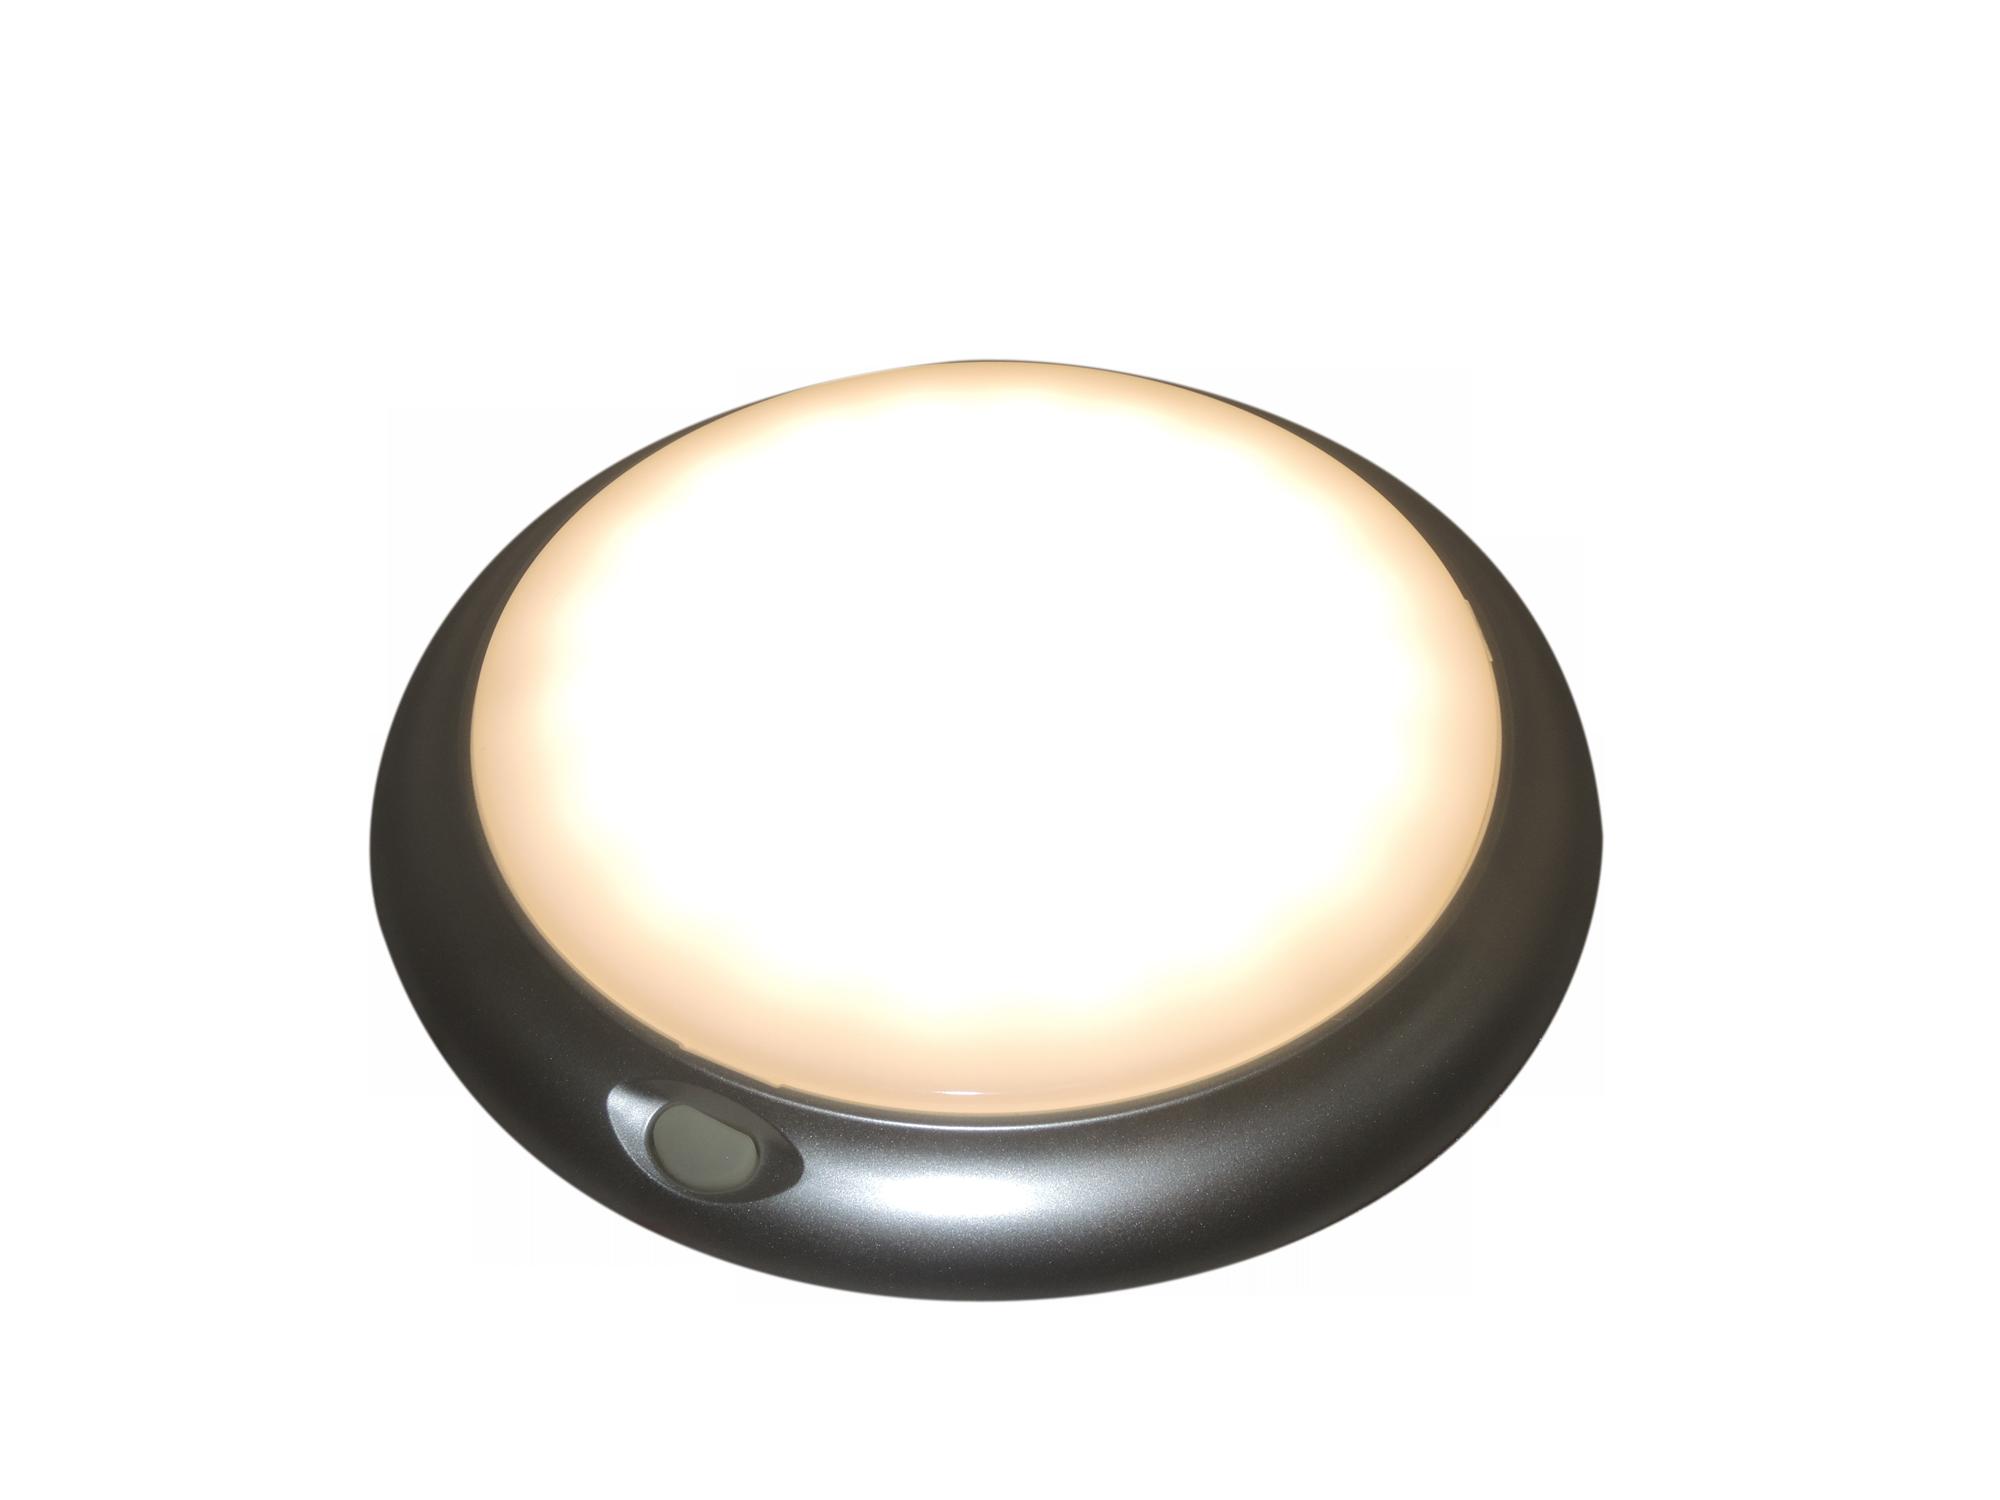 12 volt 24 volt 10-30 volt Rood en Warm wit LED plafonnière met schakelaar.